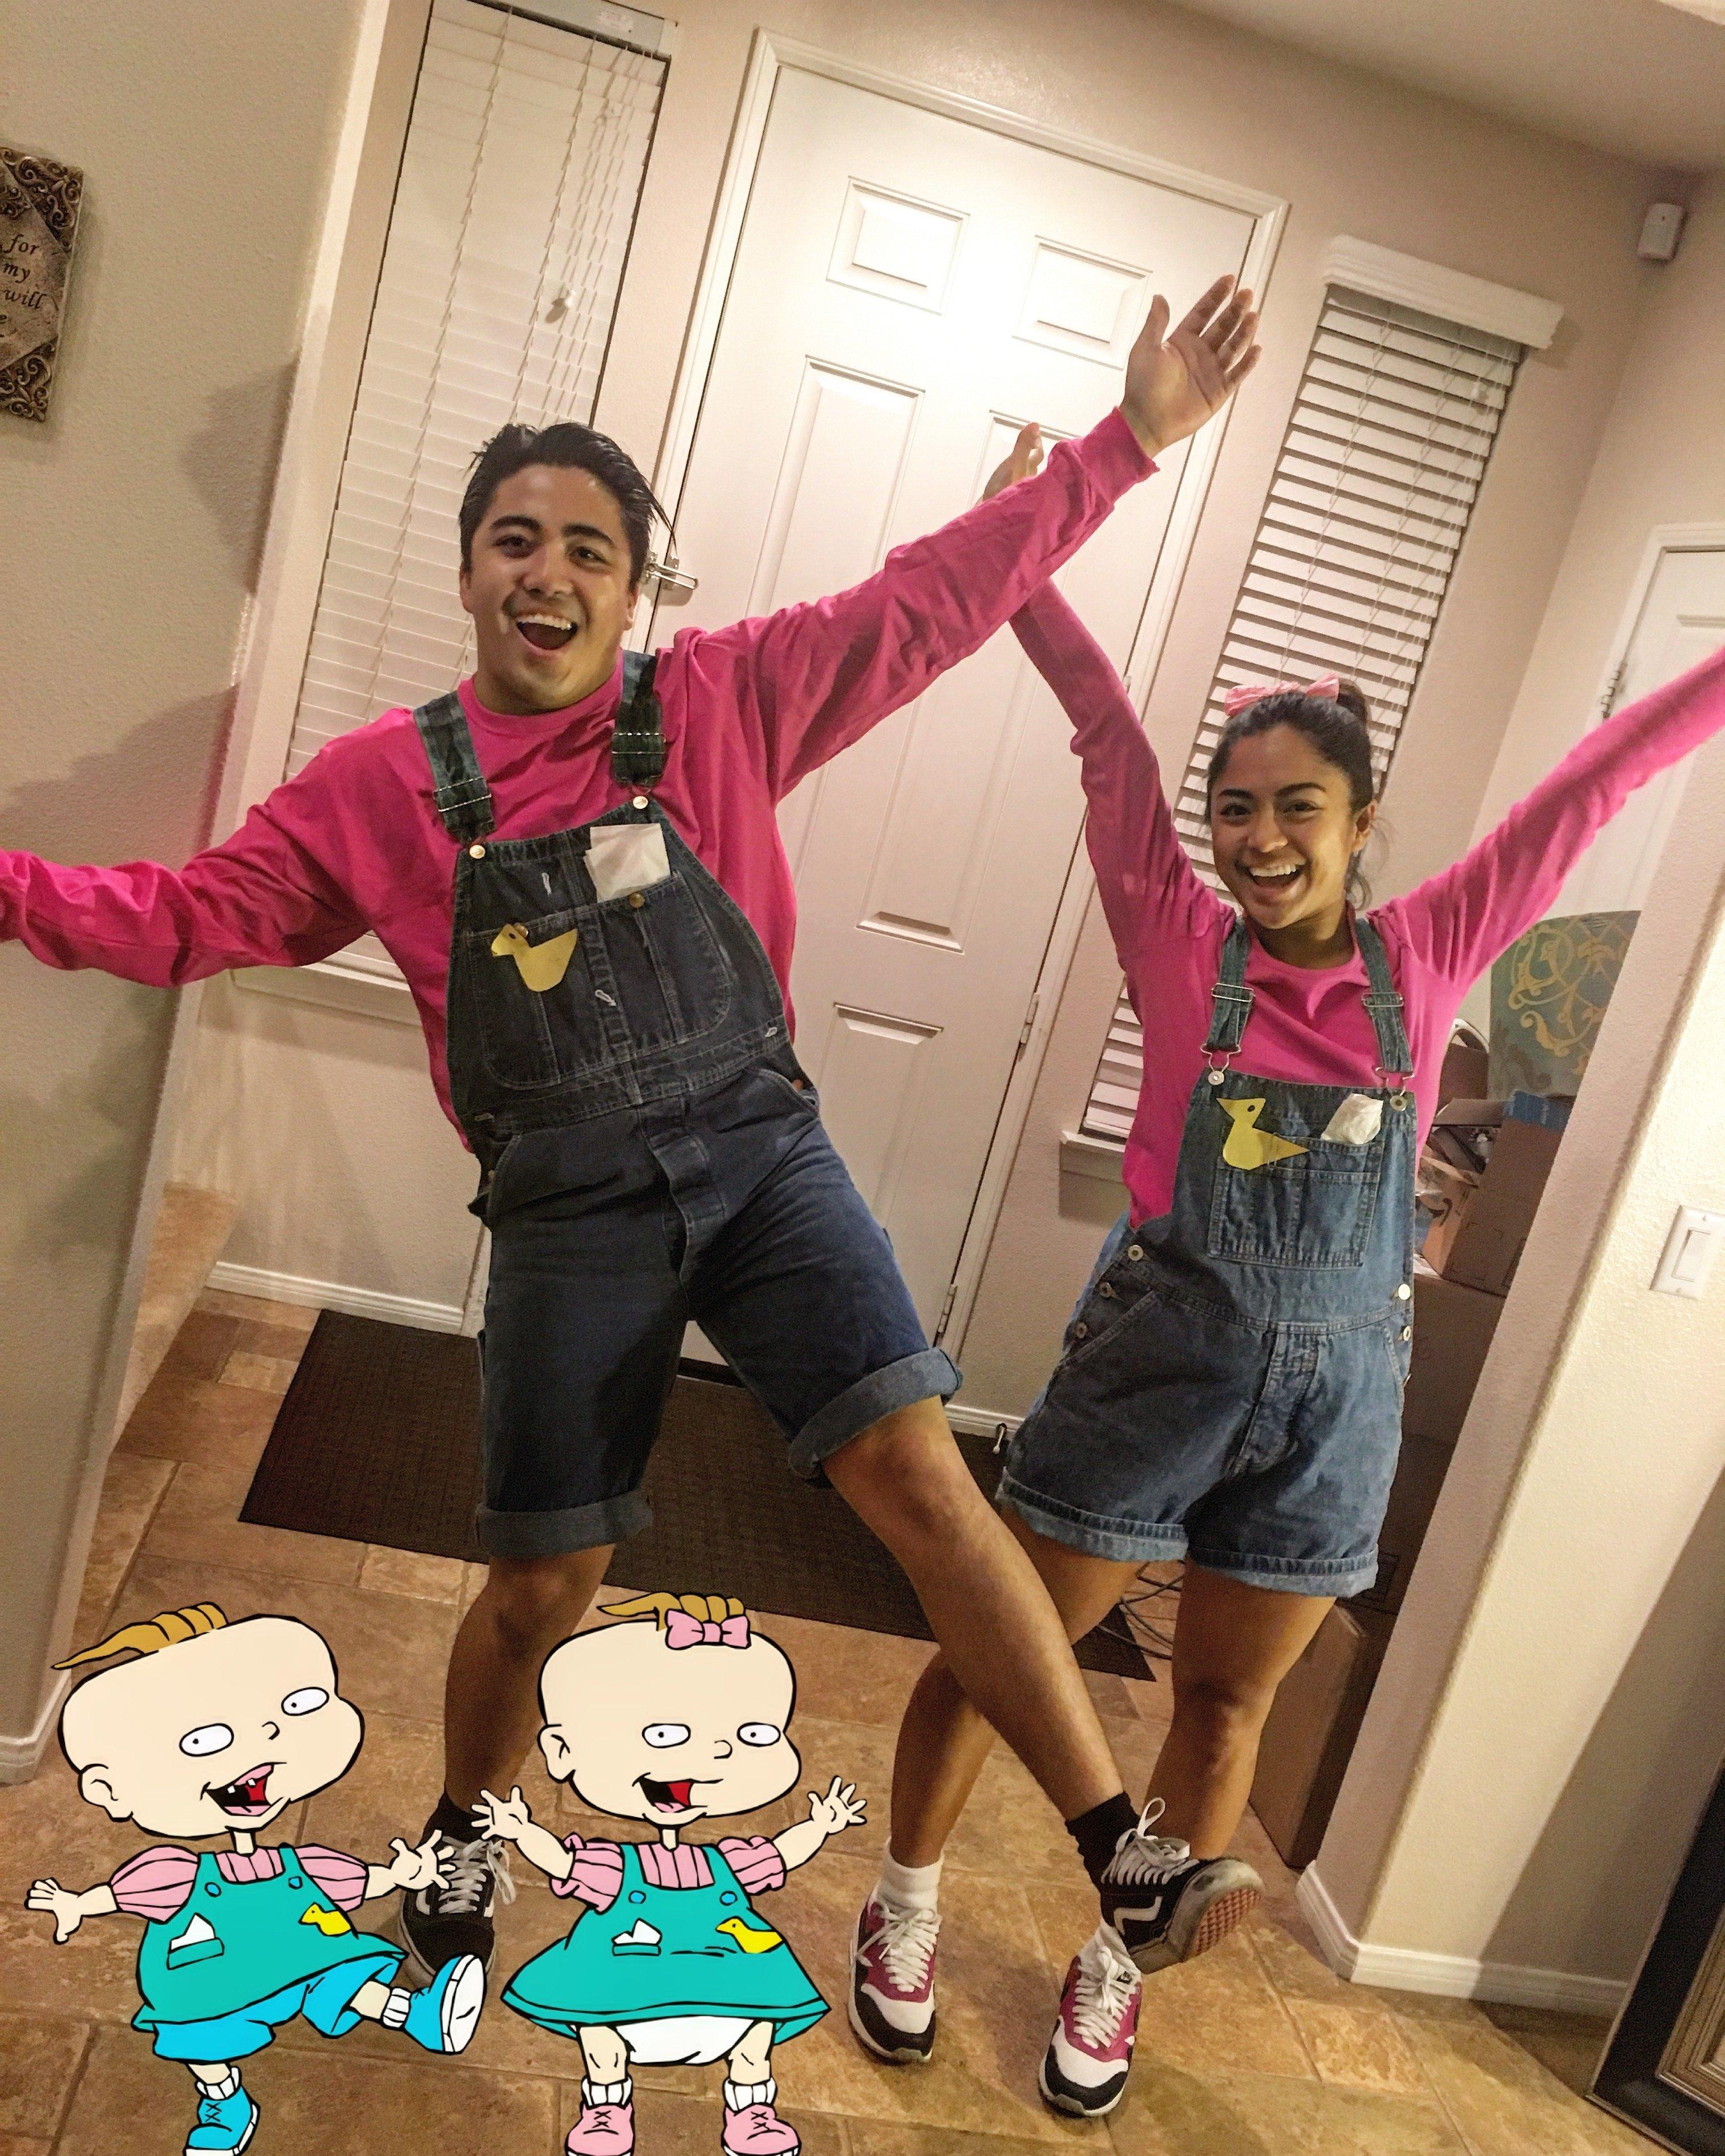 10 Cute Creative Ideas For Halloween Costumes halloween creative couple costume phil and lil from rugrats 2020